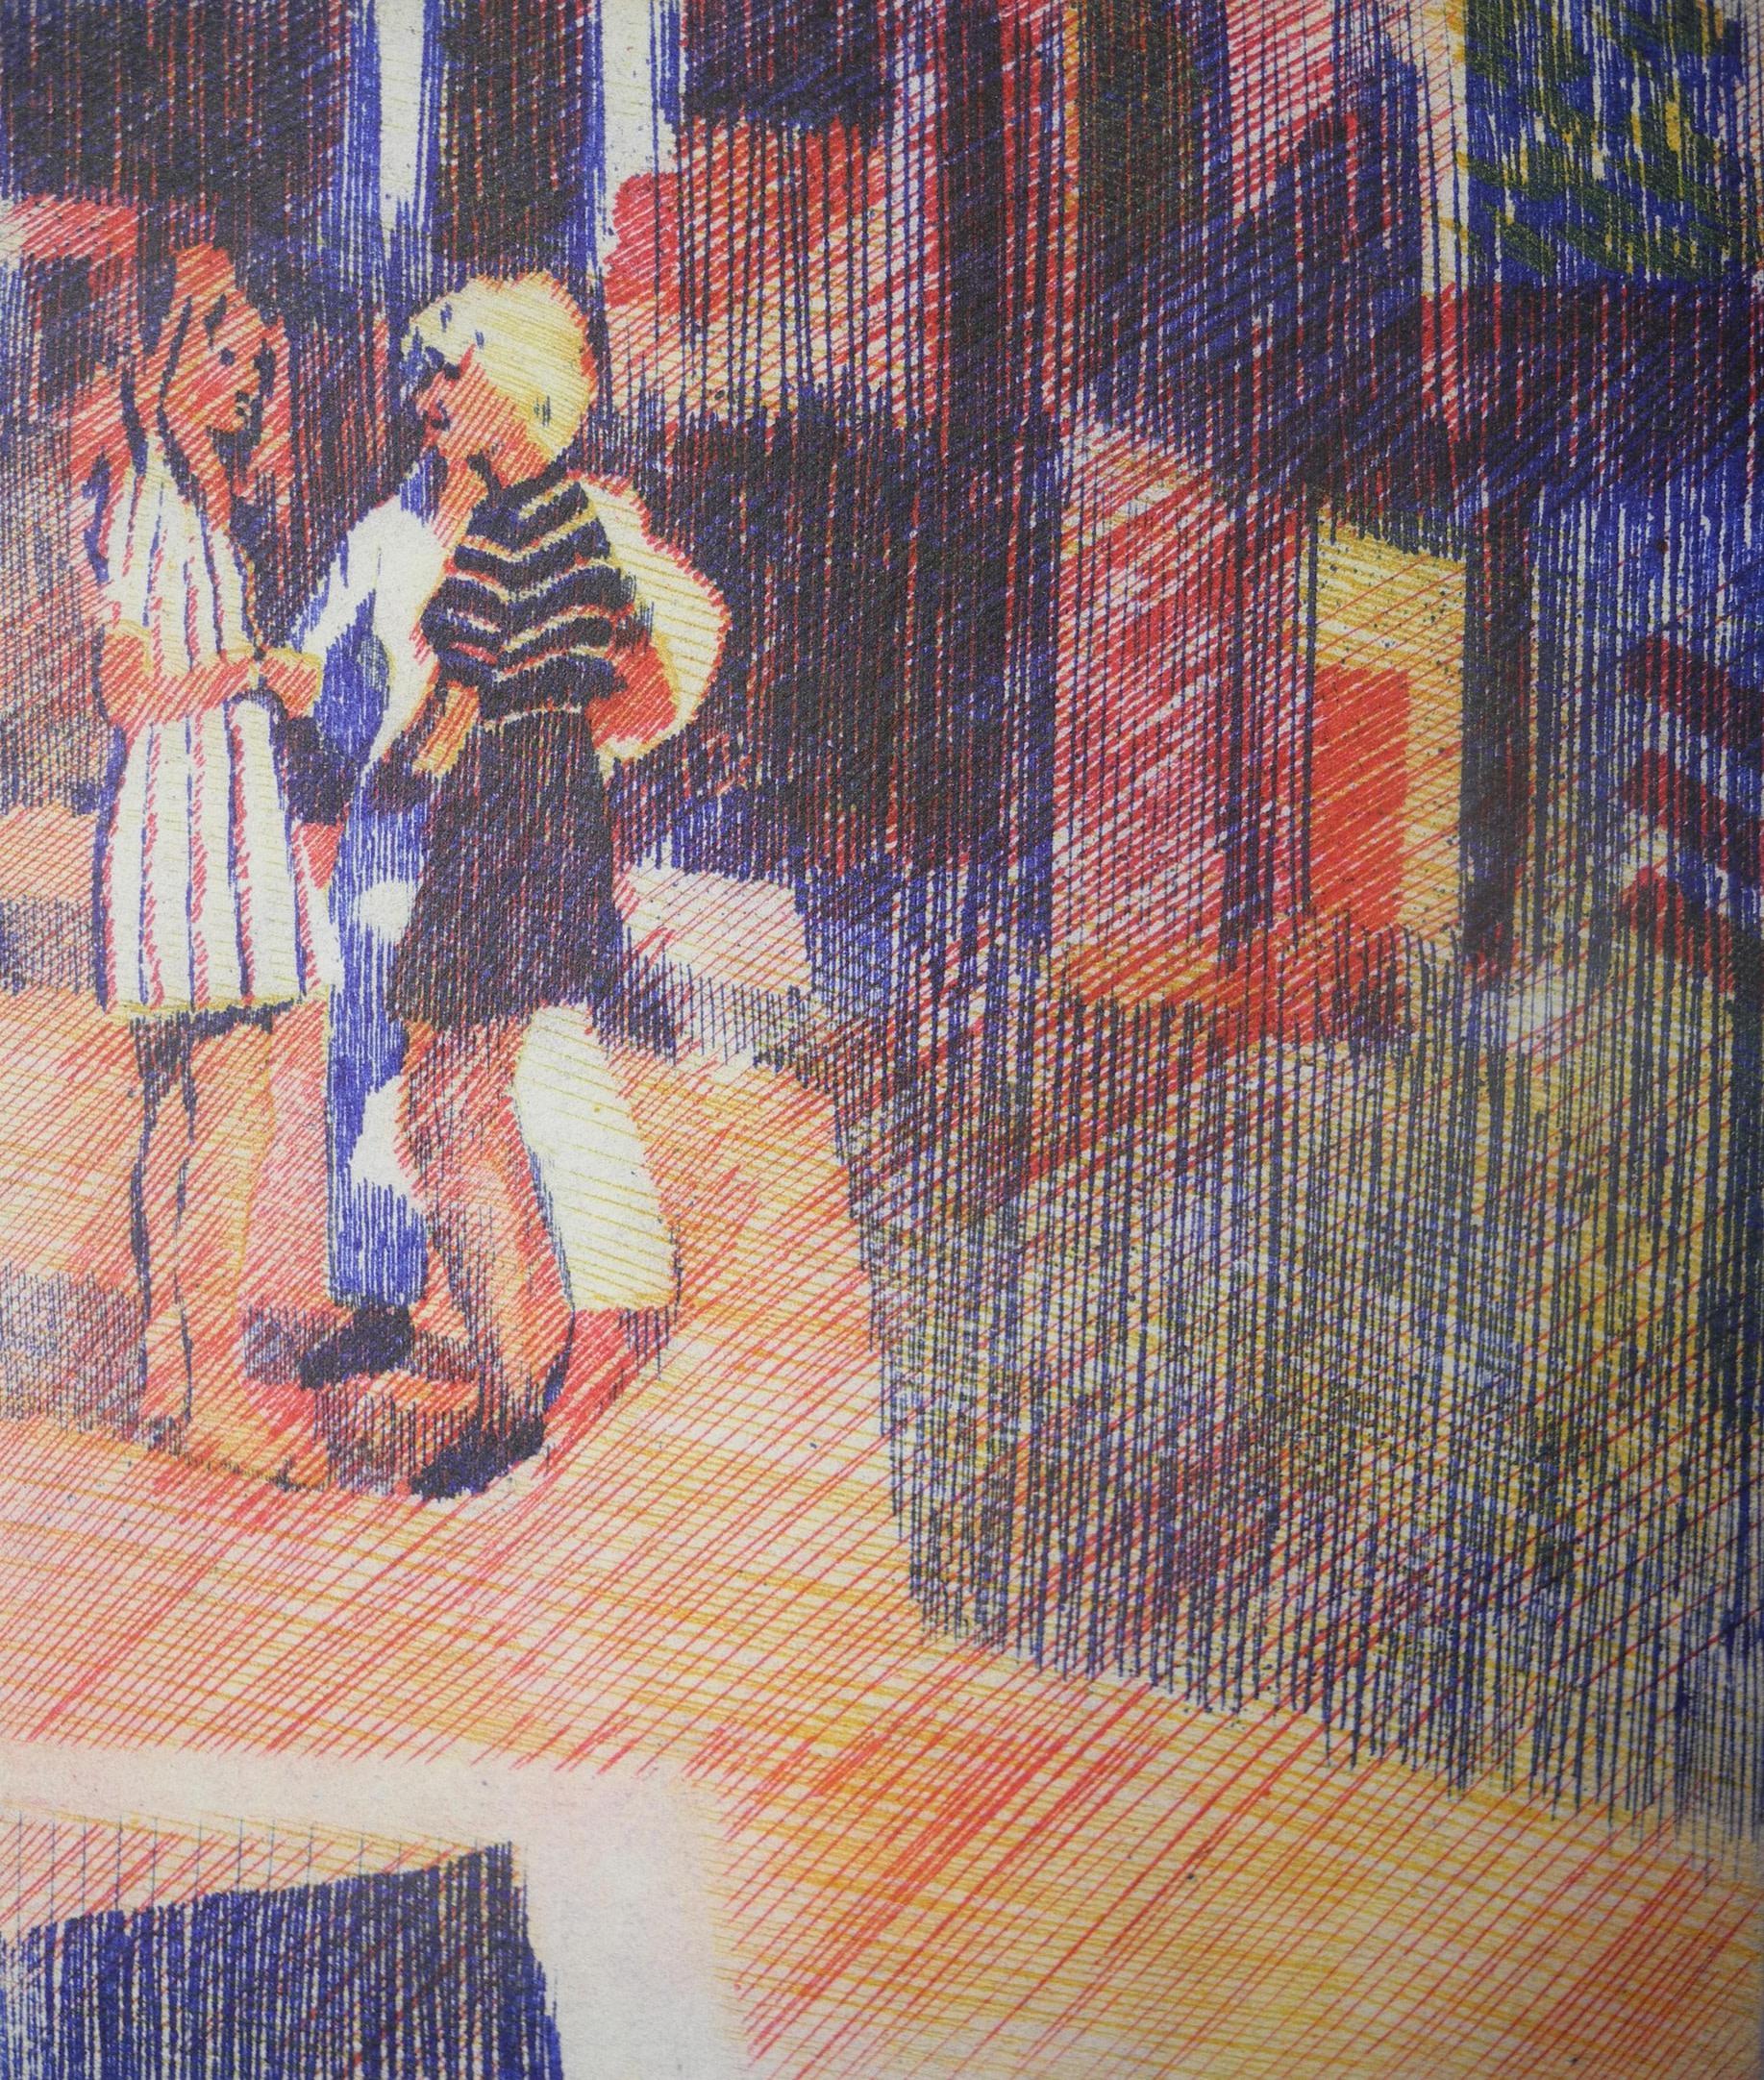 "<span class=""link fancybox-details-link""><a href=""/exhibitions/23/works/artworks_standalone11162/"">View Detail Page</a></span><div class=""artist""><span class=""artist""><strong>Adrian Bartlett RE</strong></span></div><div class=""title""><em>Street Scene</em></div><div class=""medium"">etching</div><div class=""dimensions"">16 x 14 cm </div><div class=""edition_details"">edition of 75</div>"